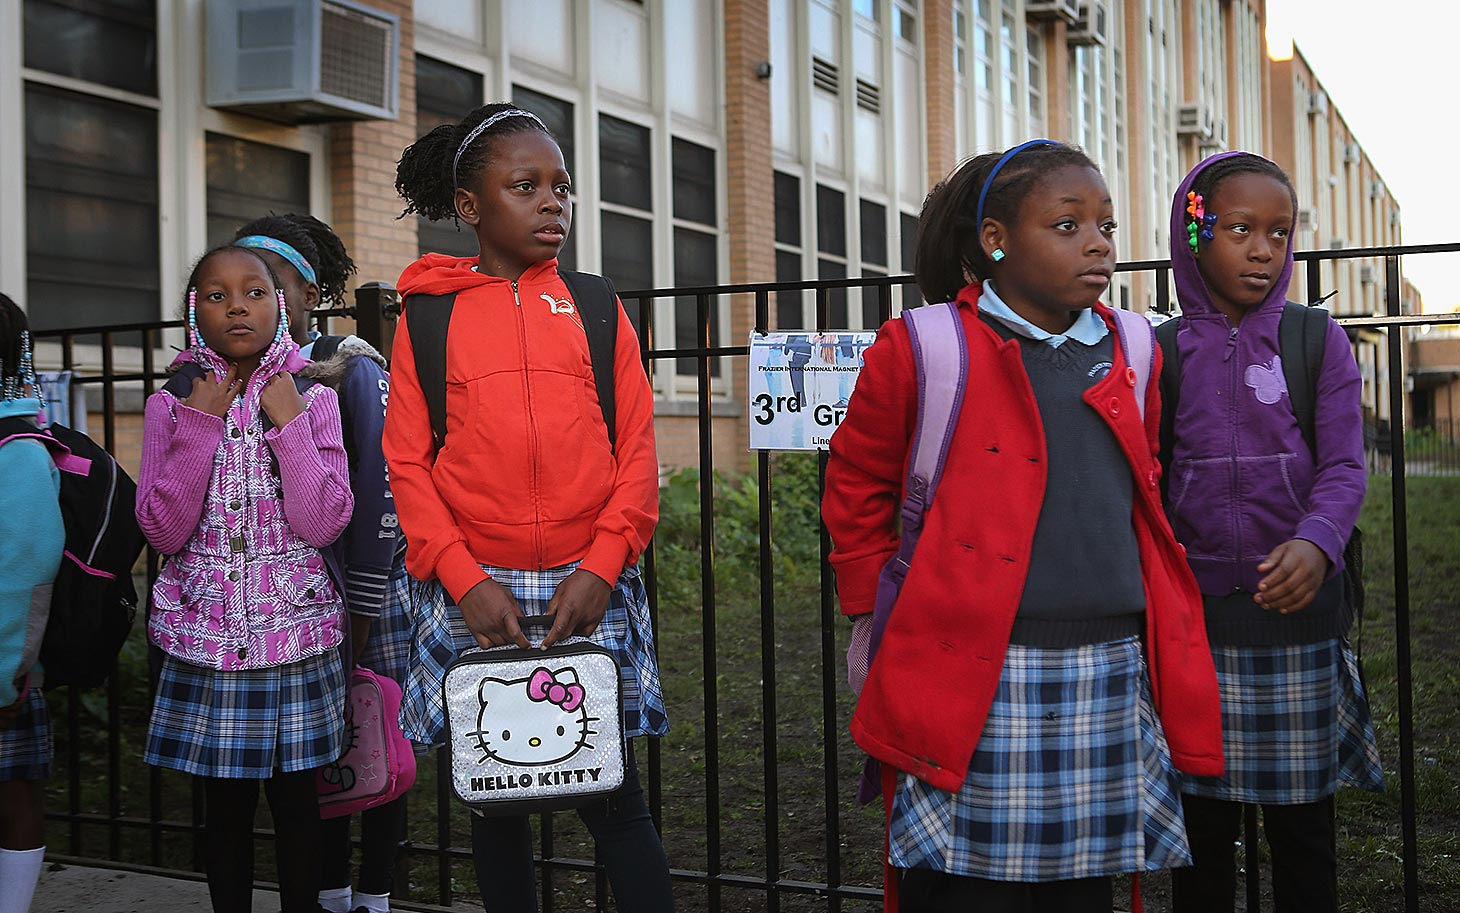 segregated schools video real footage - 960×600